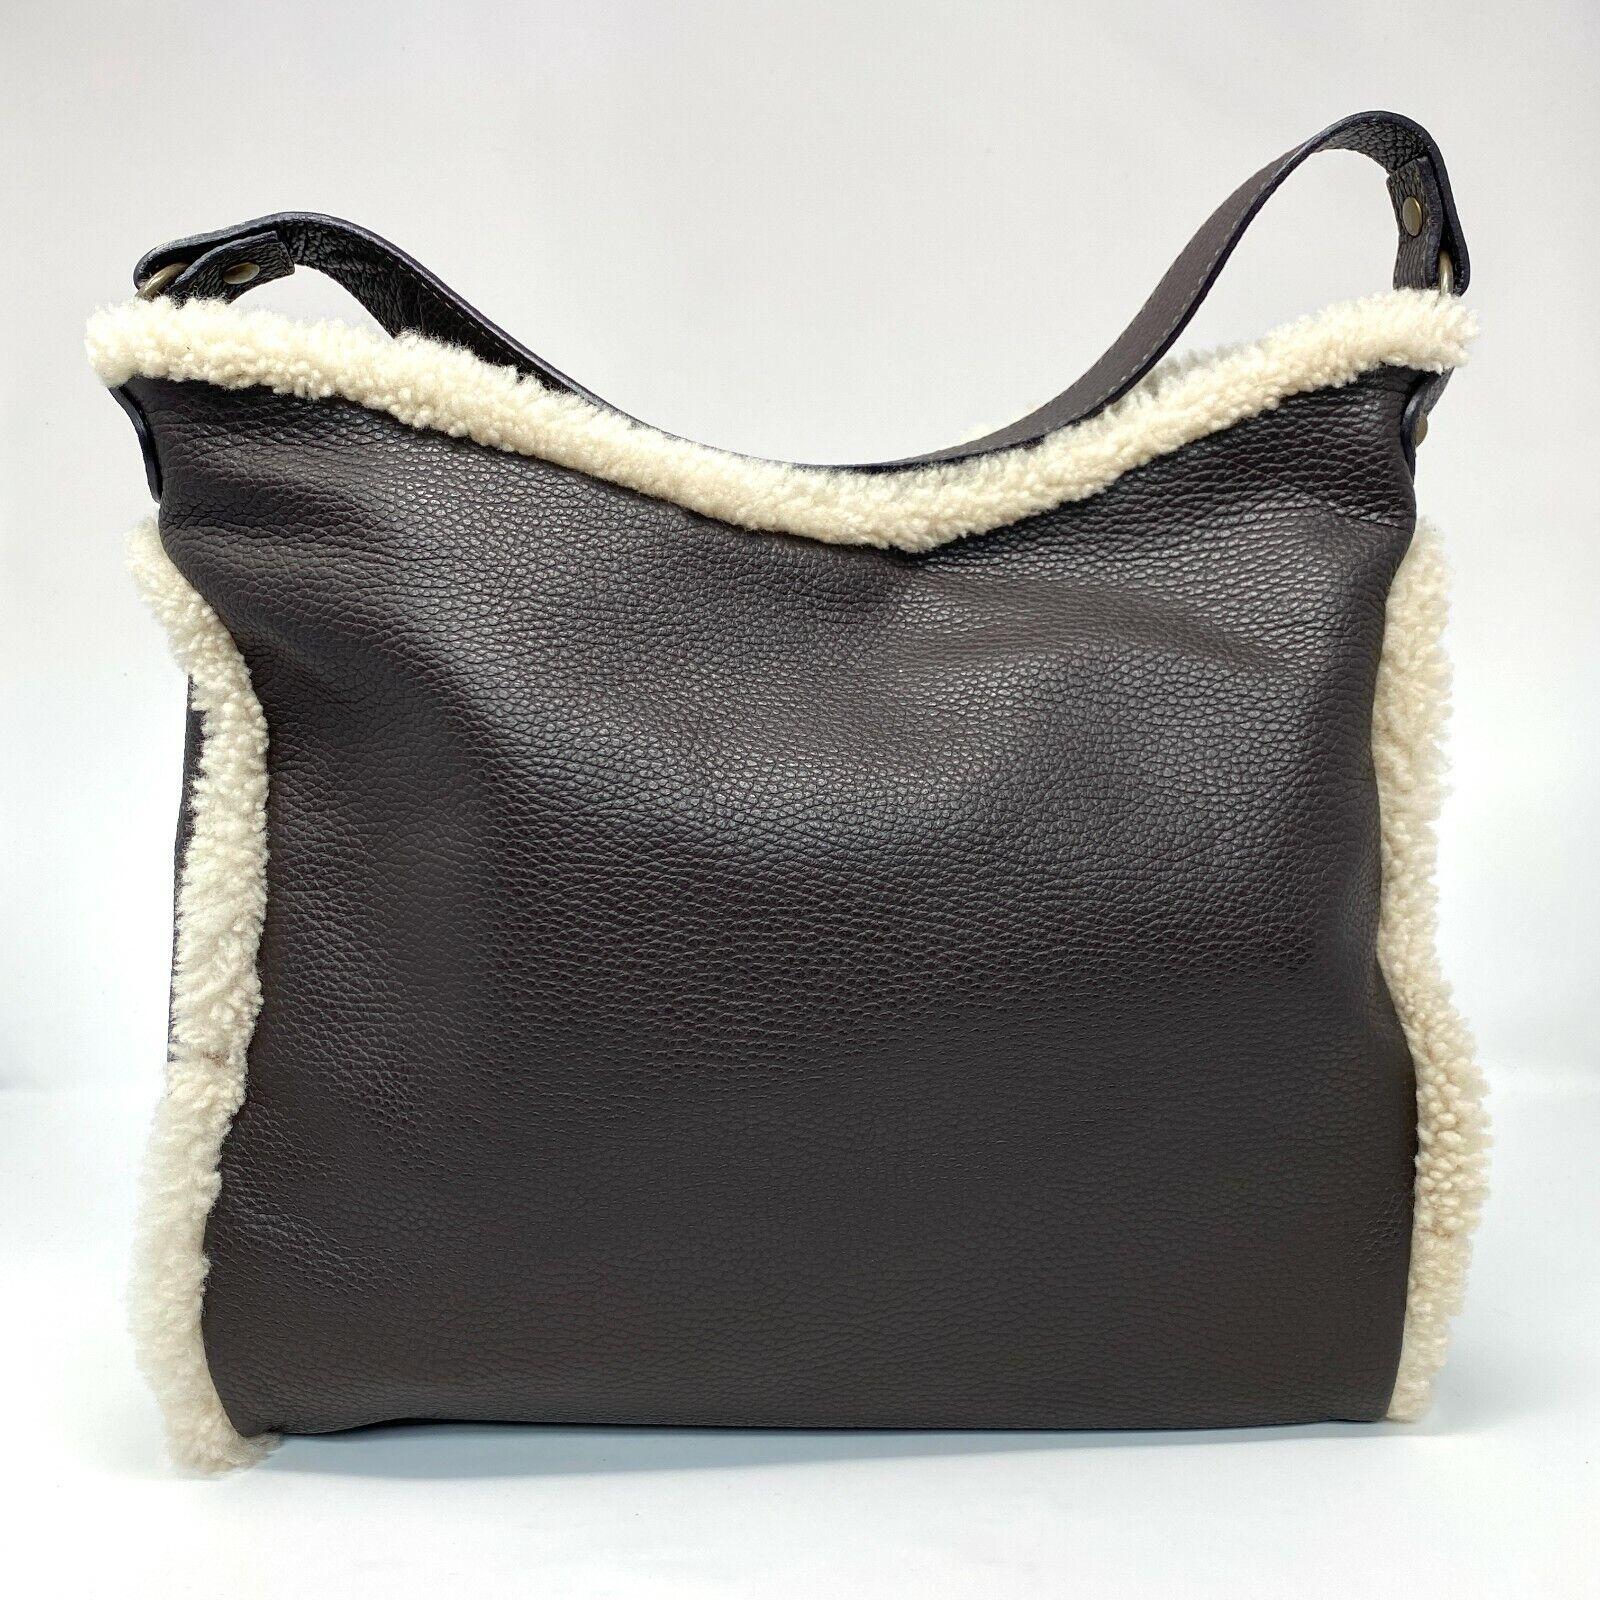 Sundance Italy Brown Leather Cream Shearling Trim Hobo Shoulder Handbag Purse